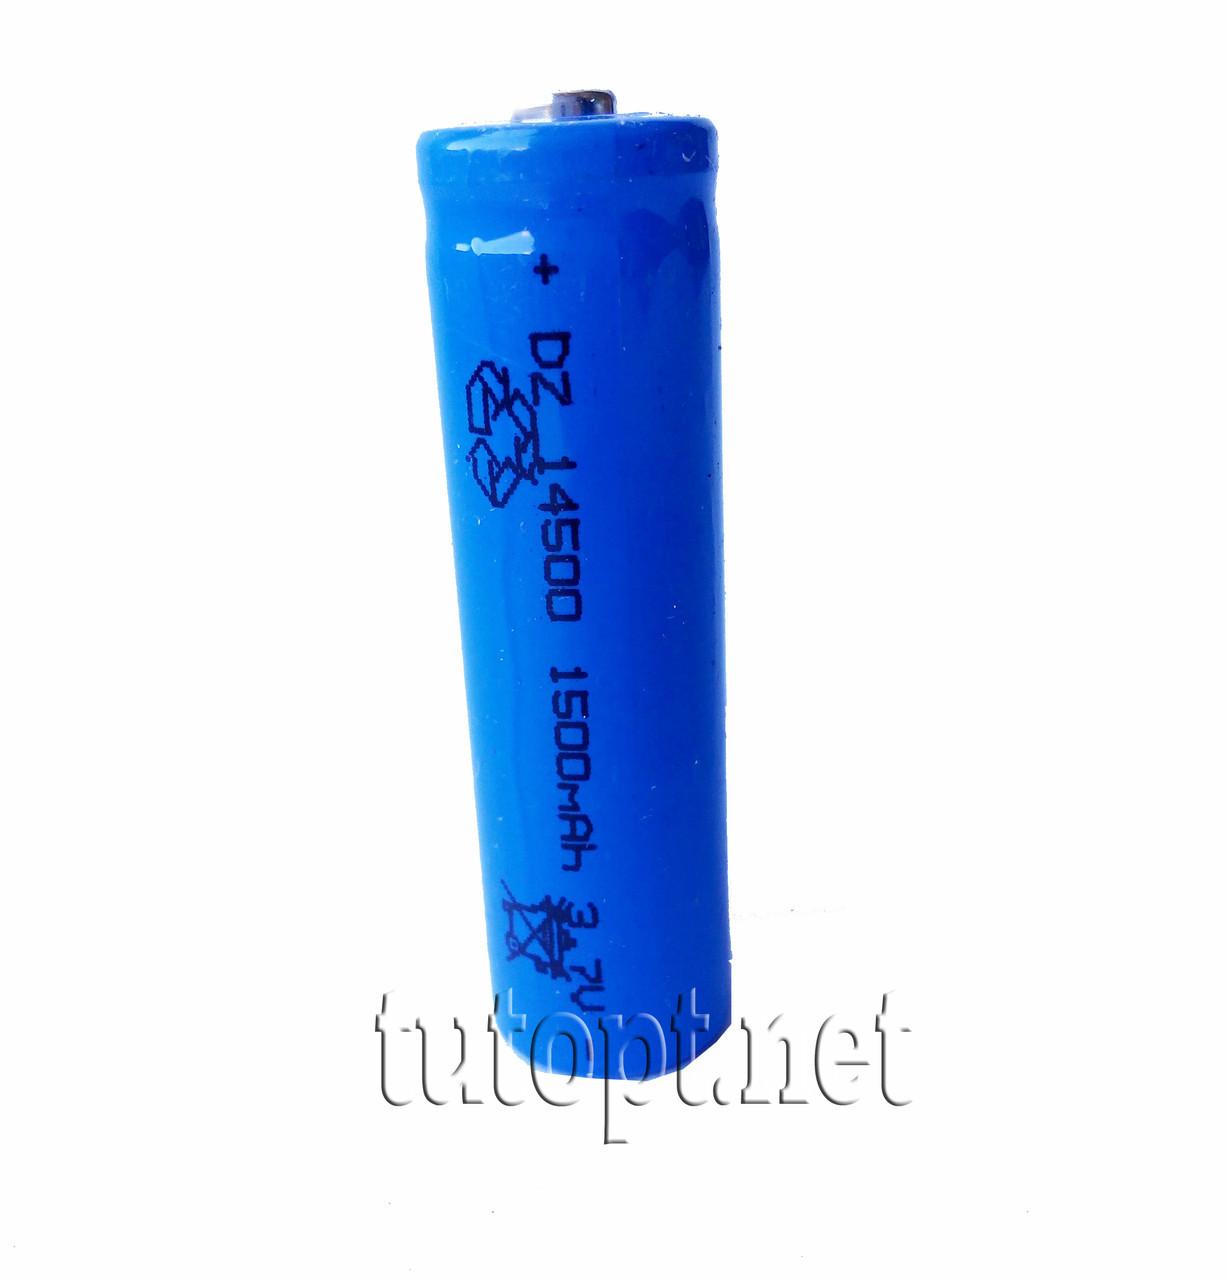 Аккумулятор 1300mAh 3.7V Li-ion 14500 / R6 / AA